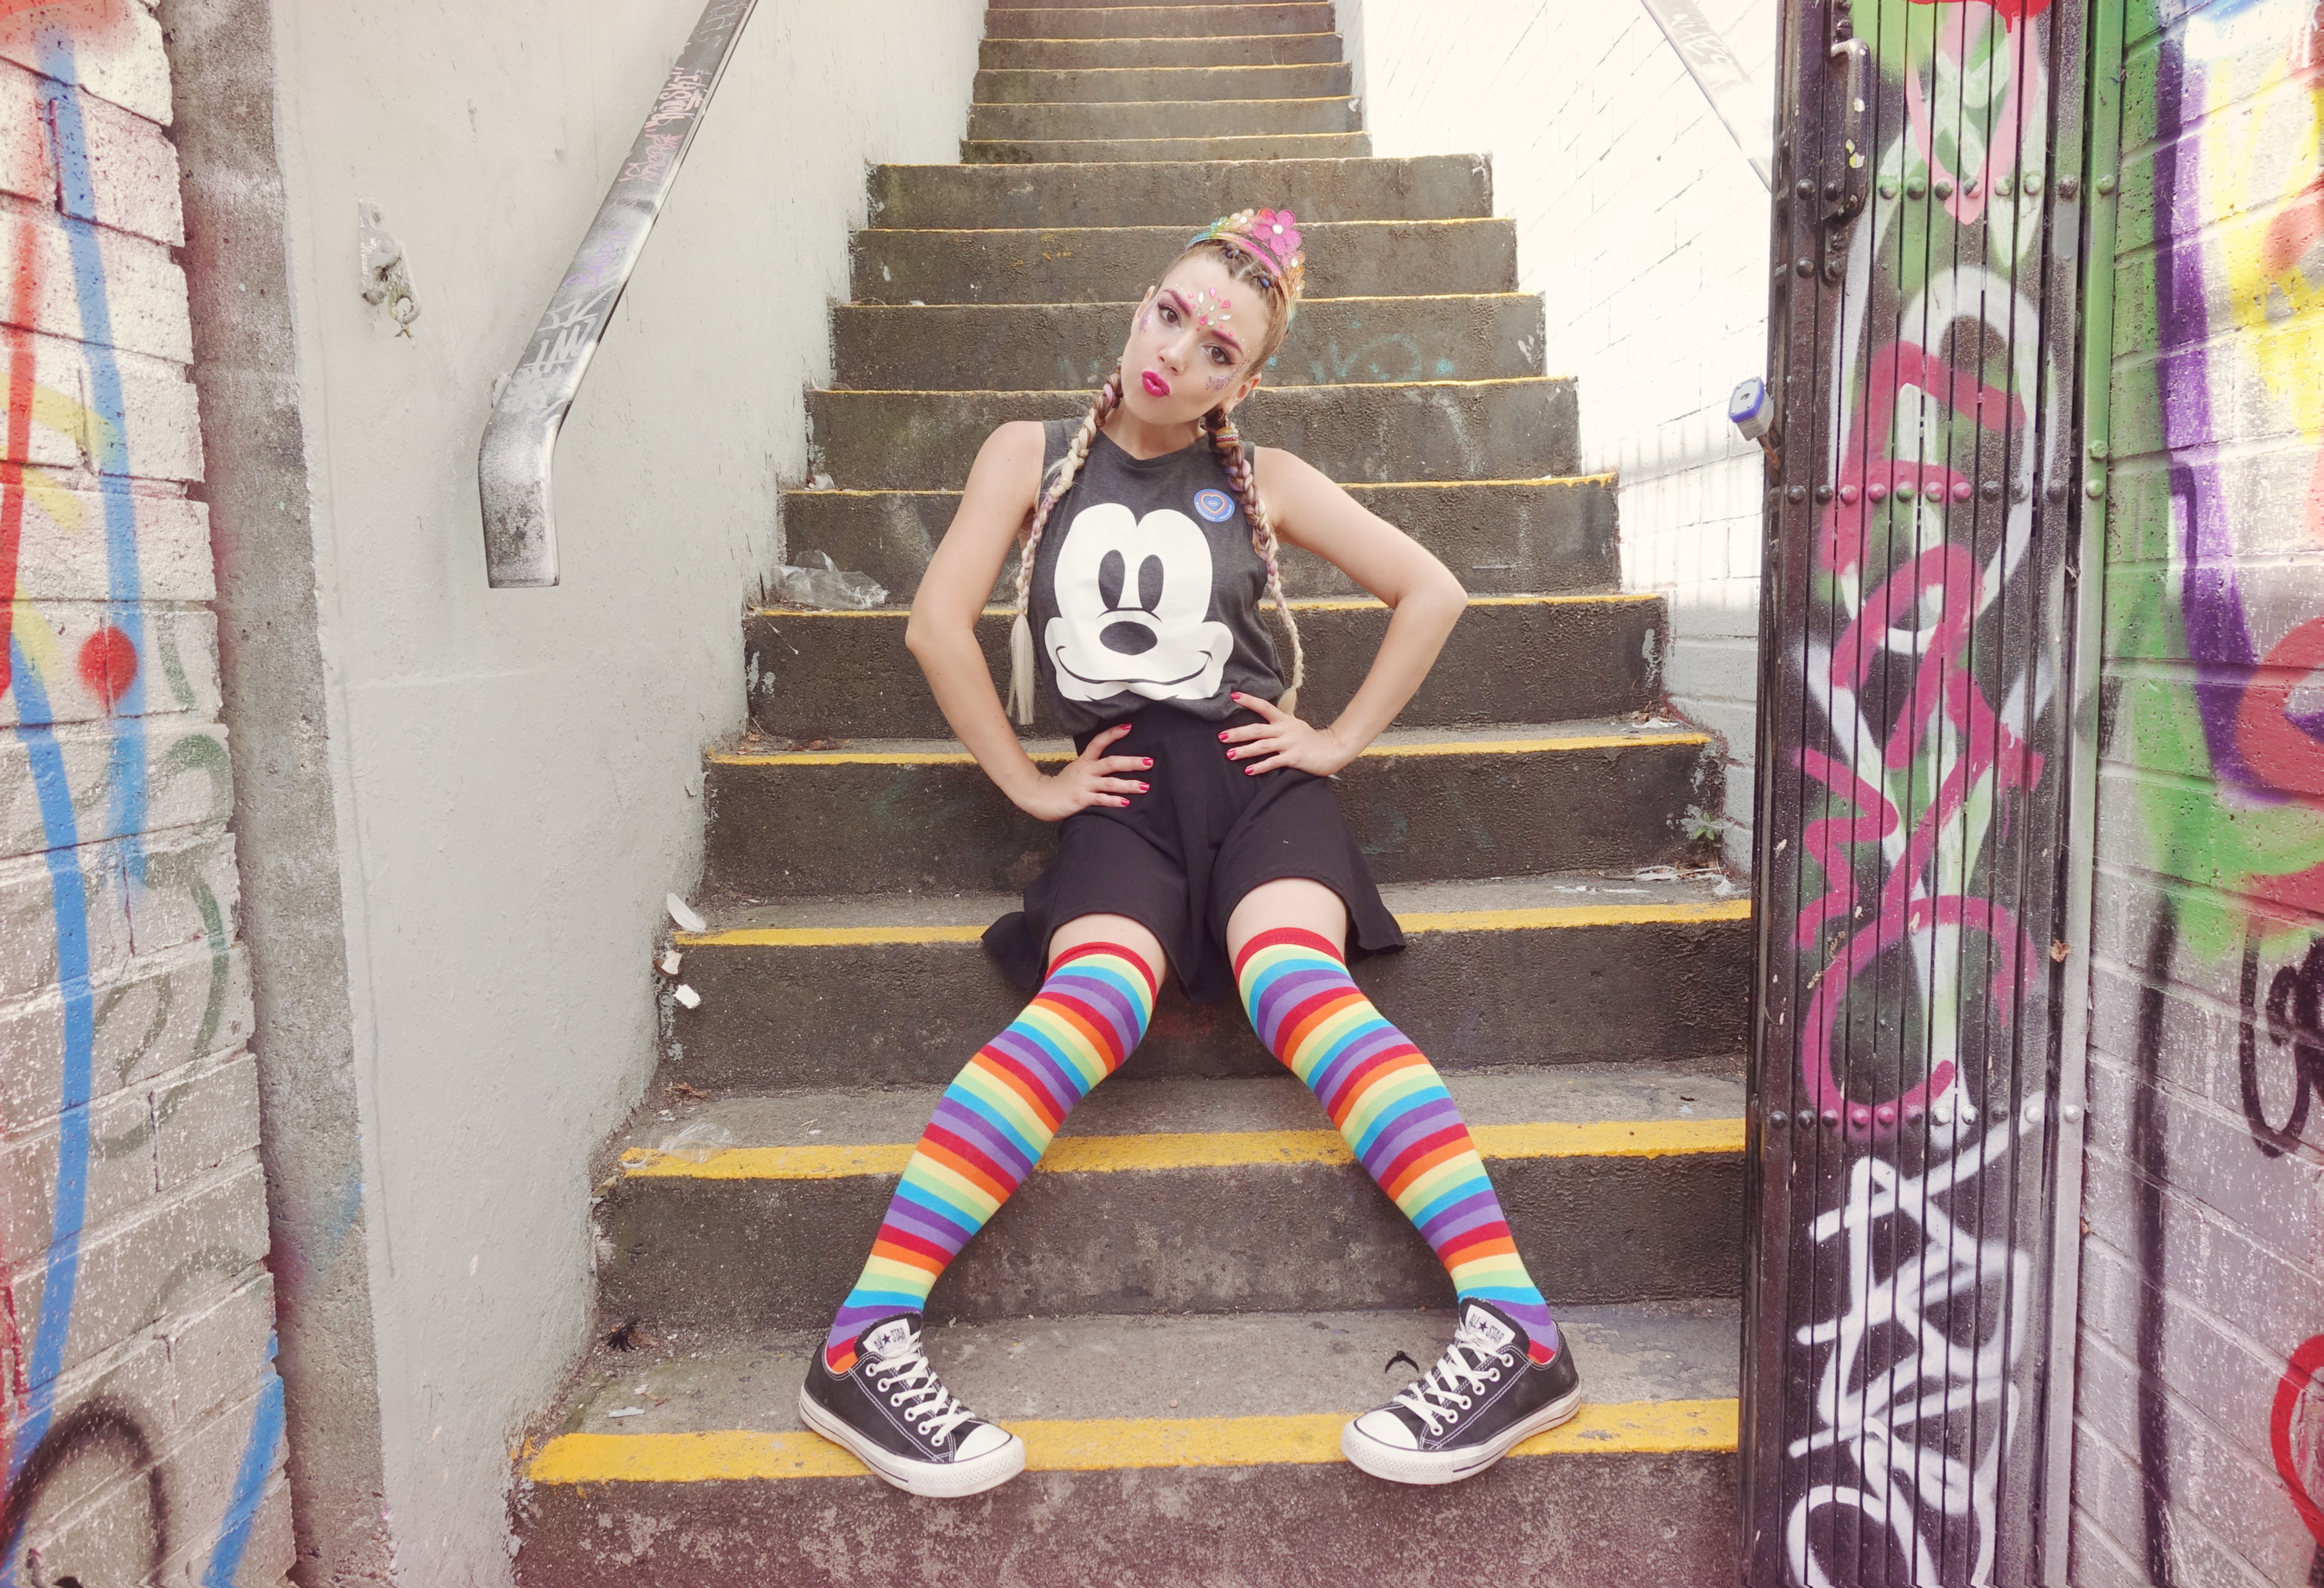 Looks-para-festivales-camisetas-de-Mickey-PiensaenChic-influencer-ChicAdicta-fashionista-maquillaje-de-sirena-glitter-makeup-Chic-adicta-Piensa-en-Chic